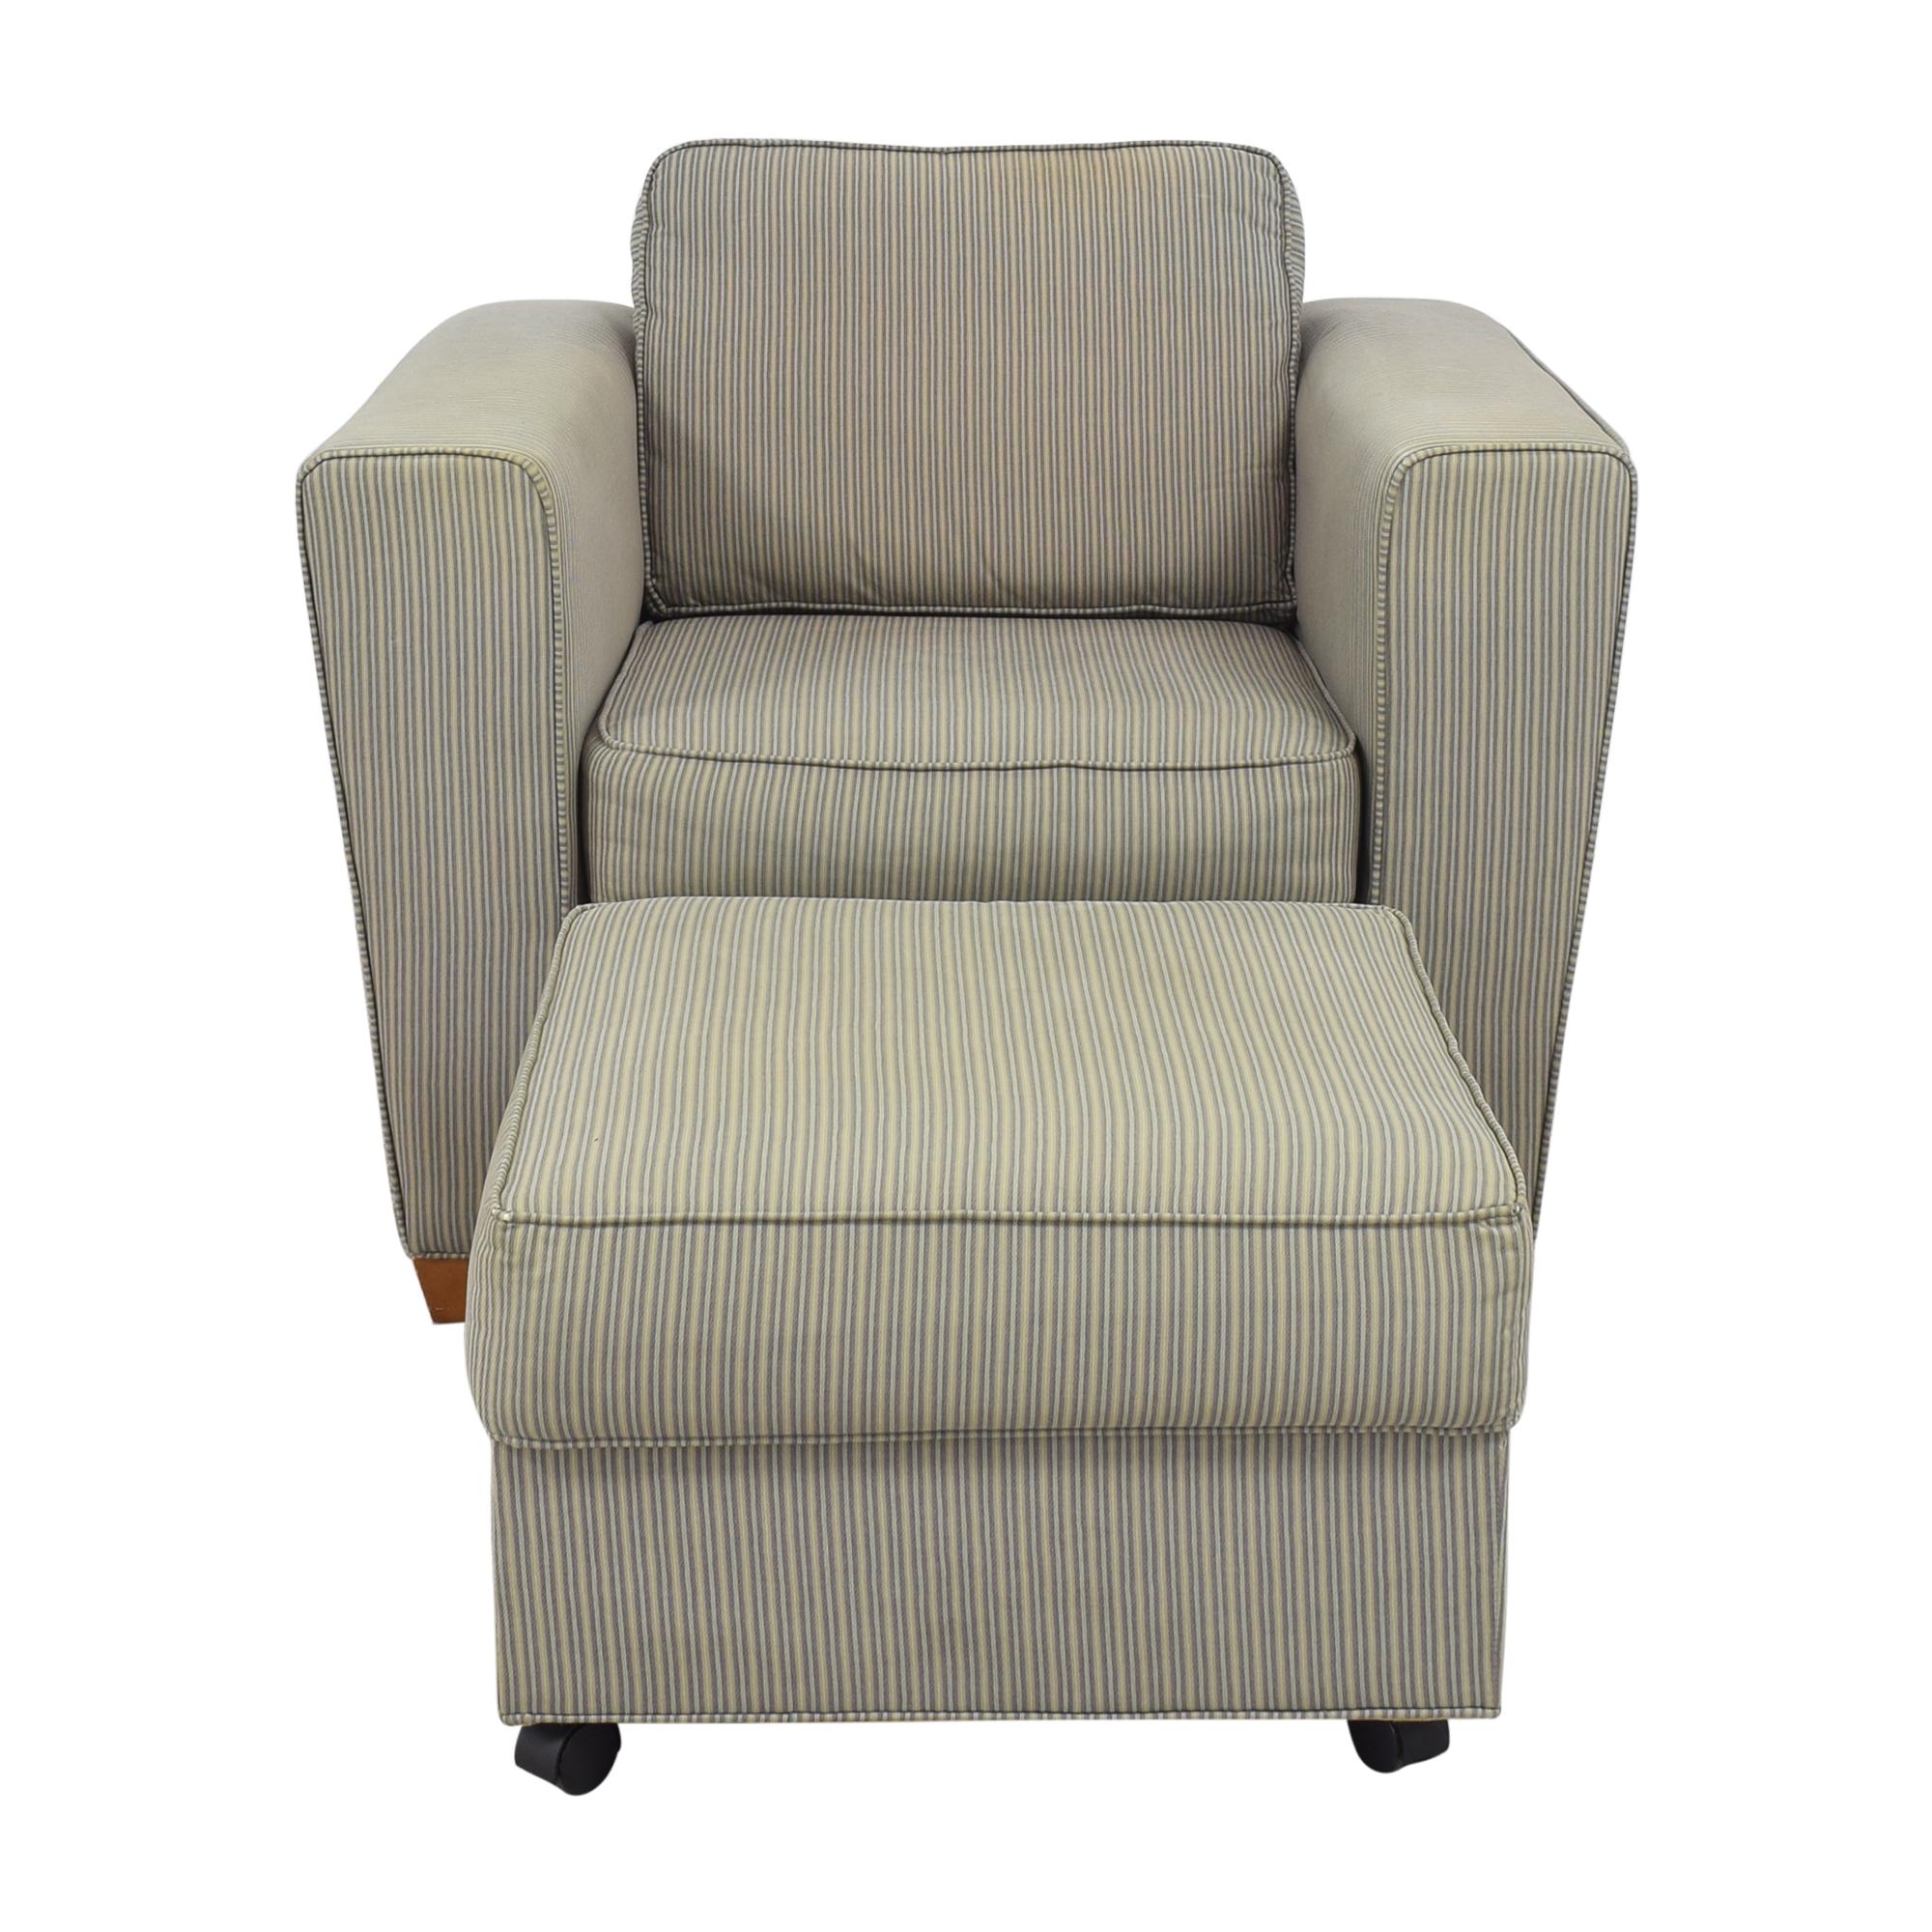 Castro Convertibles Castro Convertibles Chair with Ottoman price